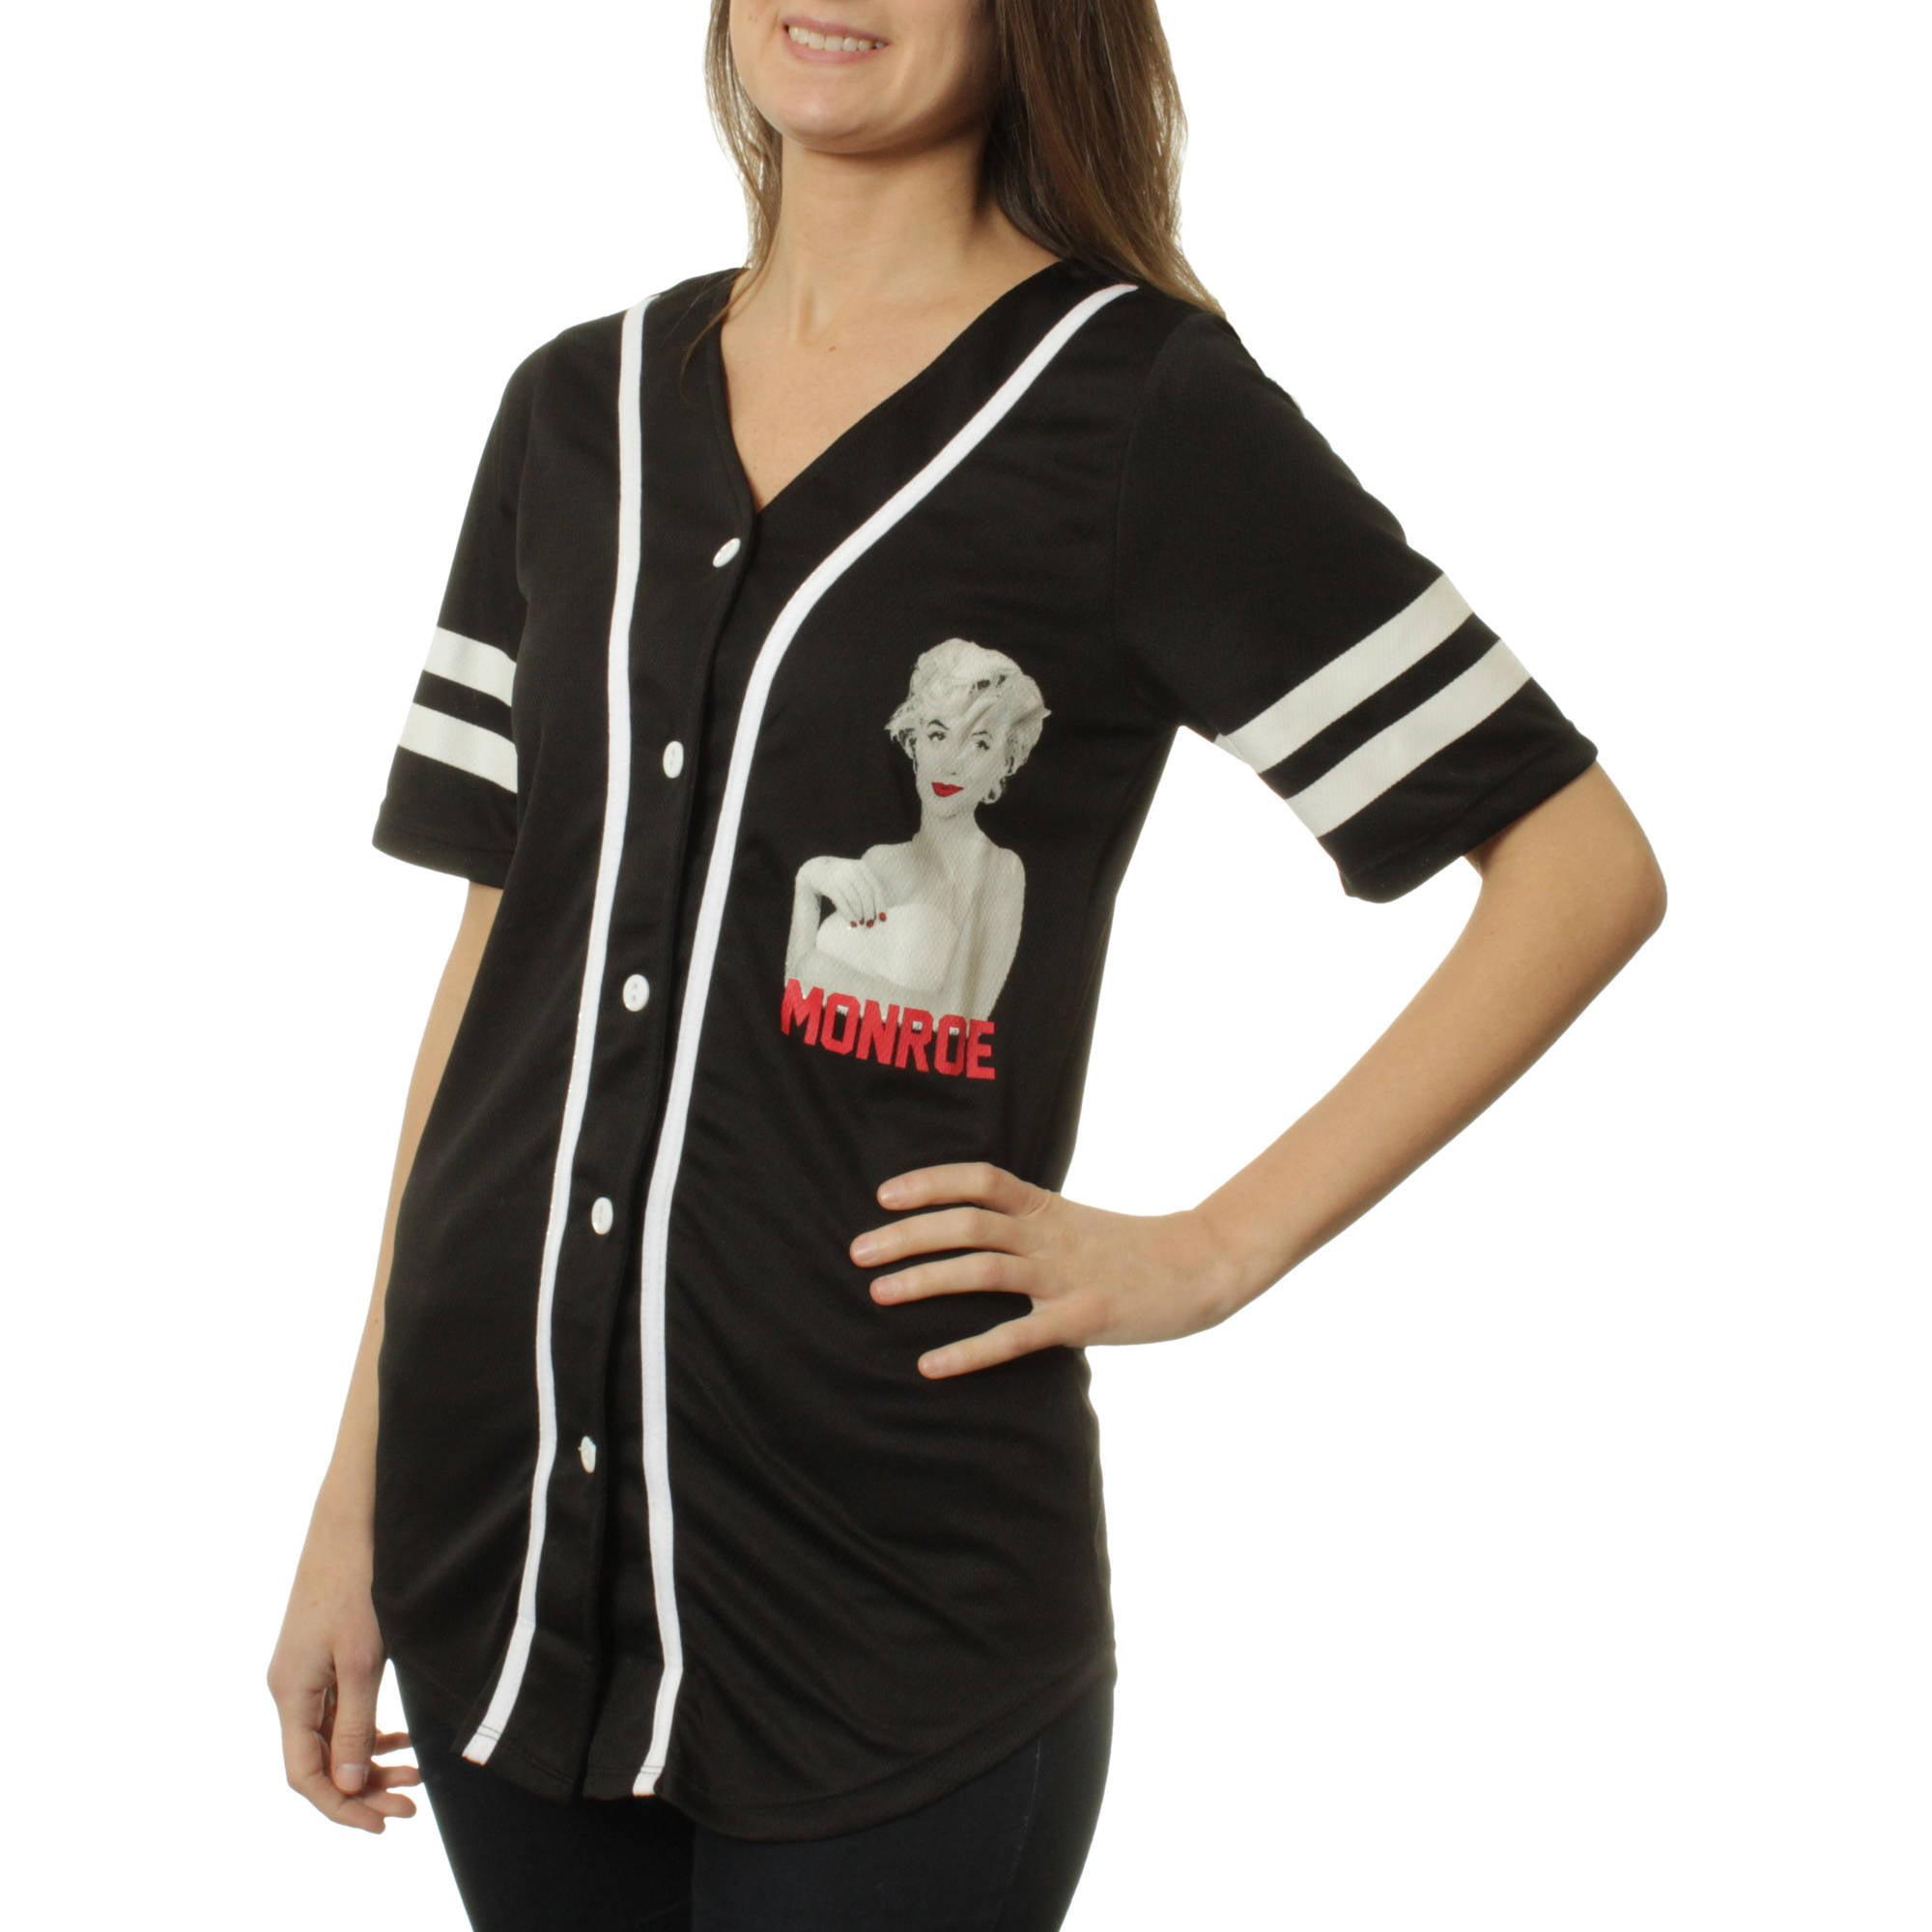 Marilyn Monroe Juniors' Graphic Button Front Athletic Mesh Baseball Shirt